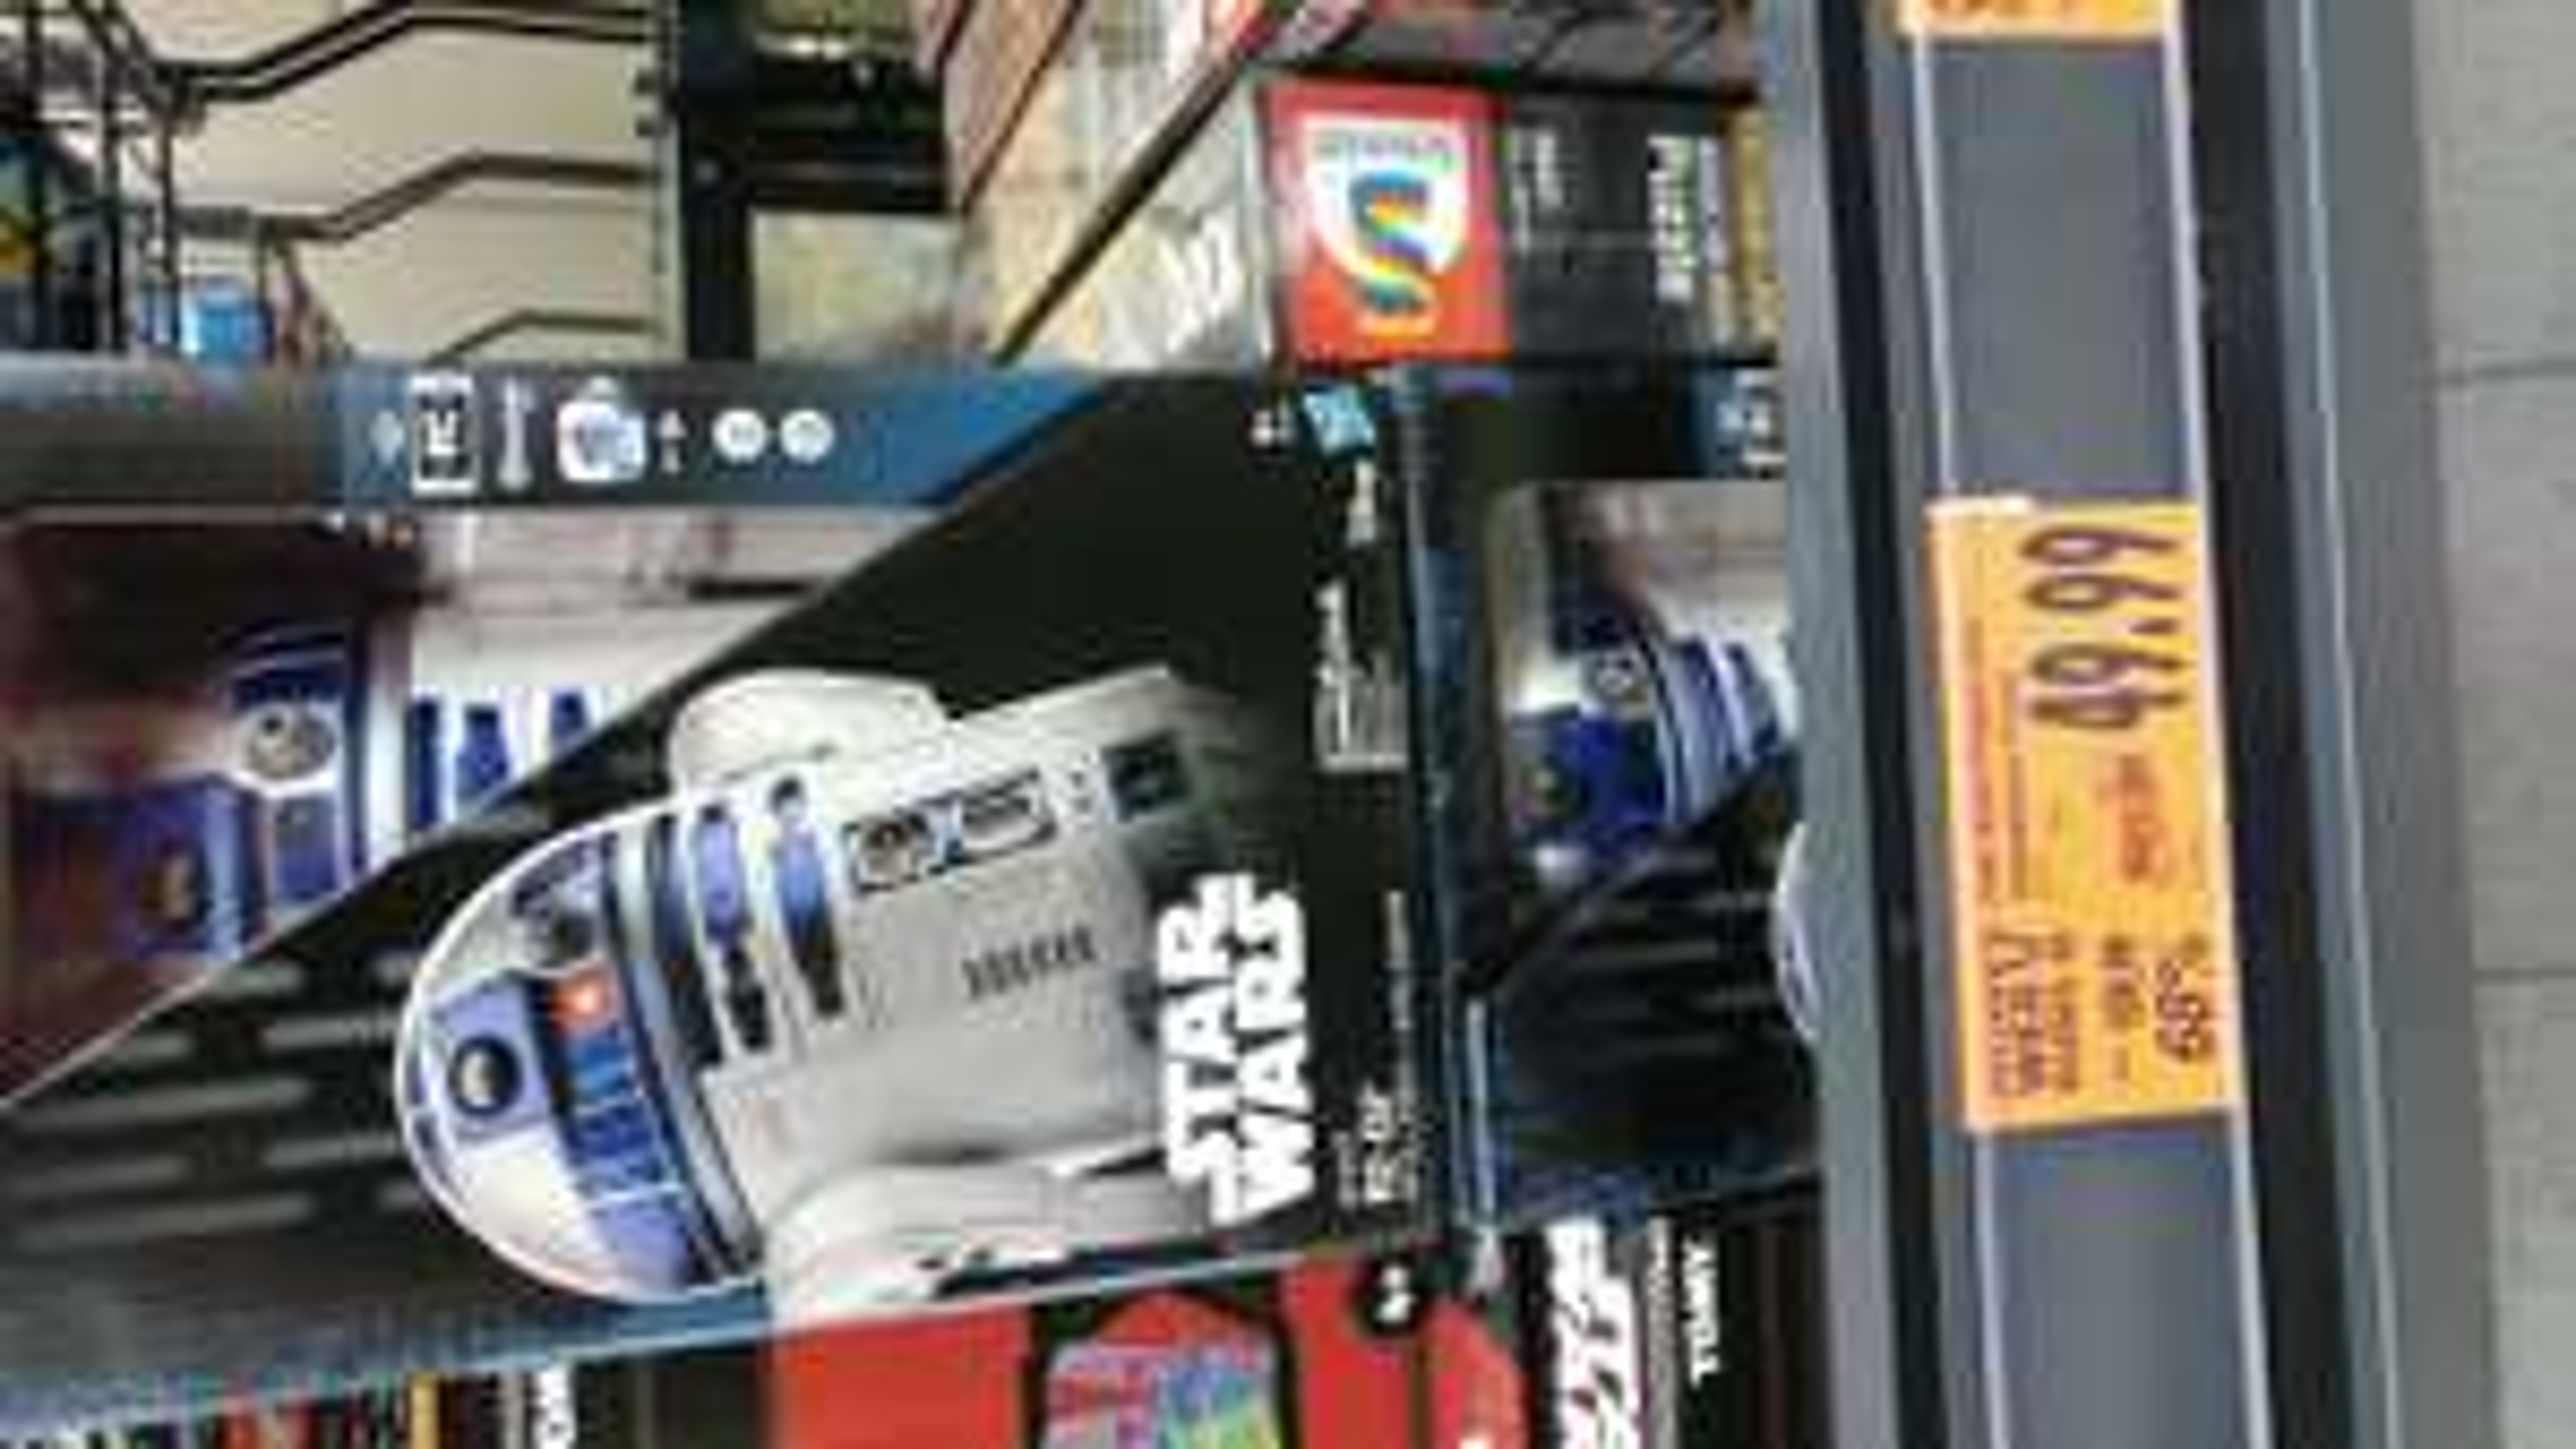 R2-D2 - Ferngesteuerte Star Wars Figur  lokal Kaufland Zwickau